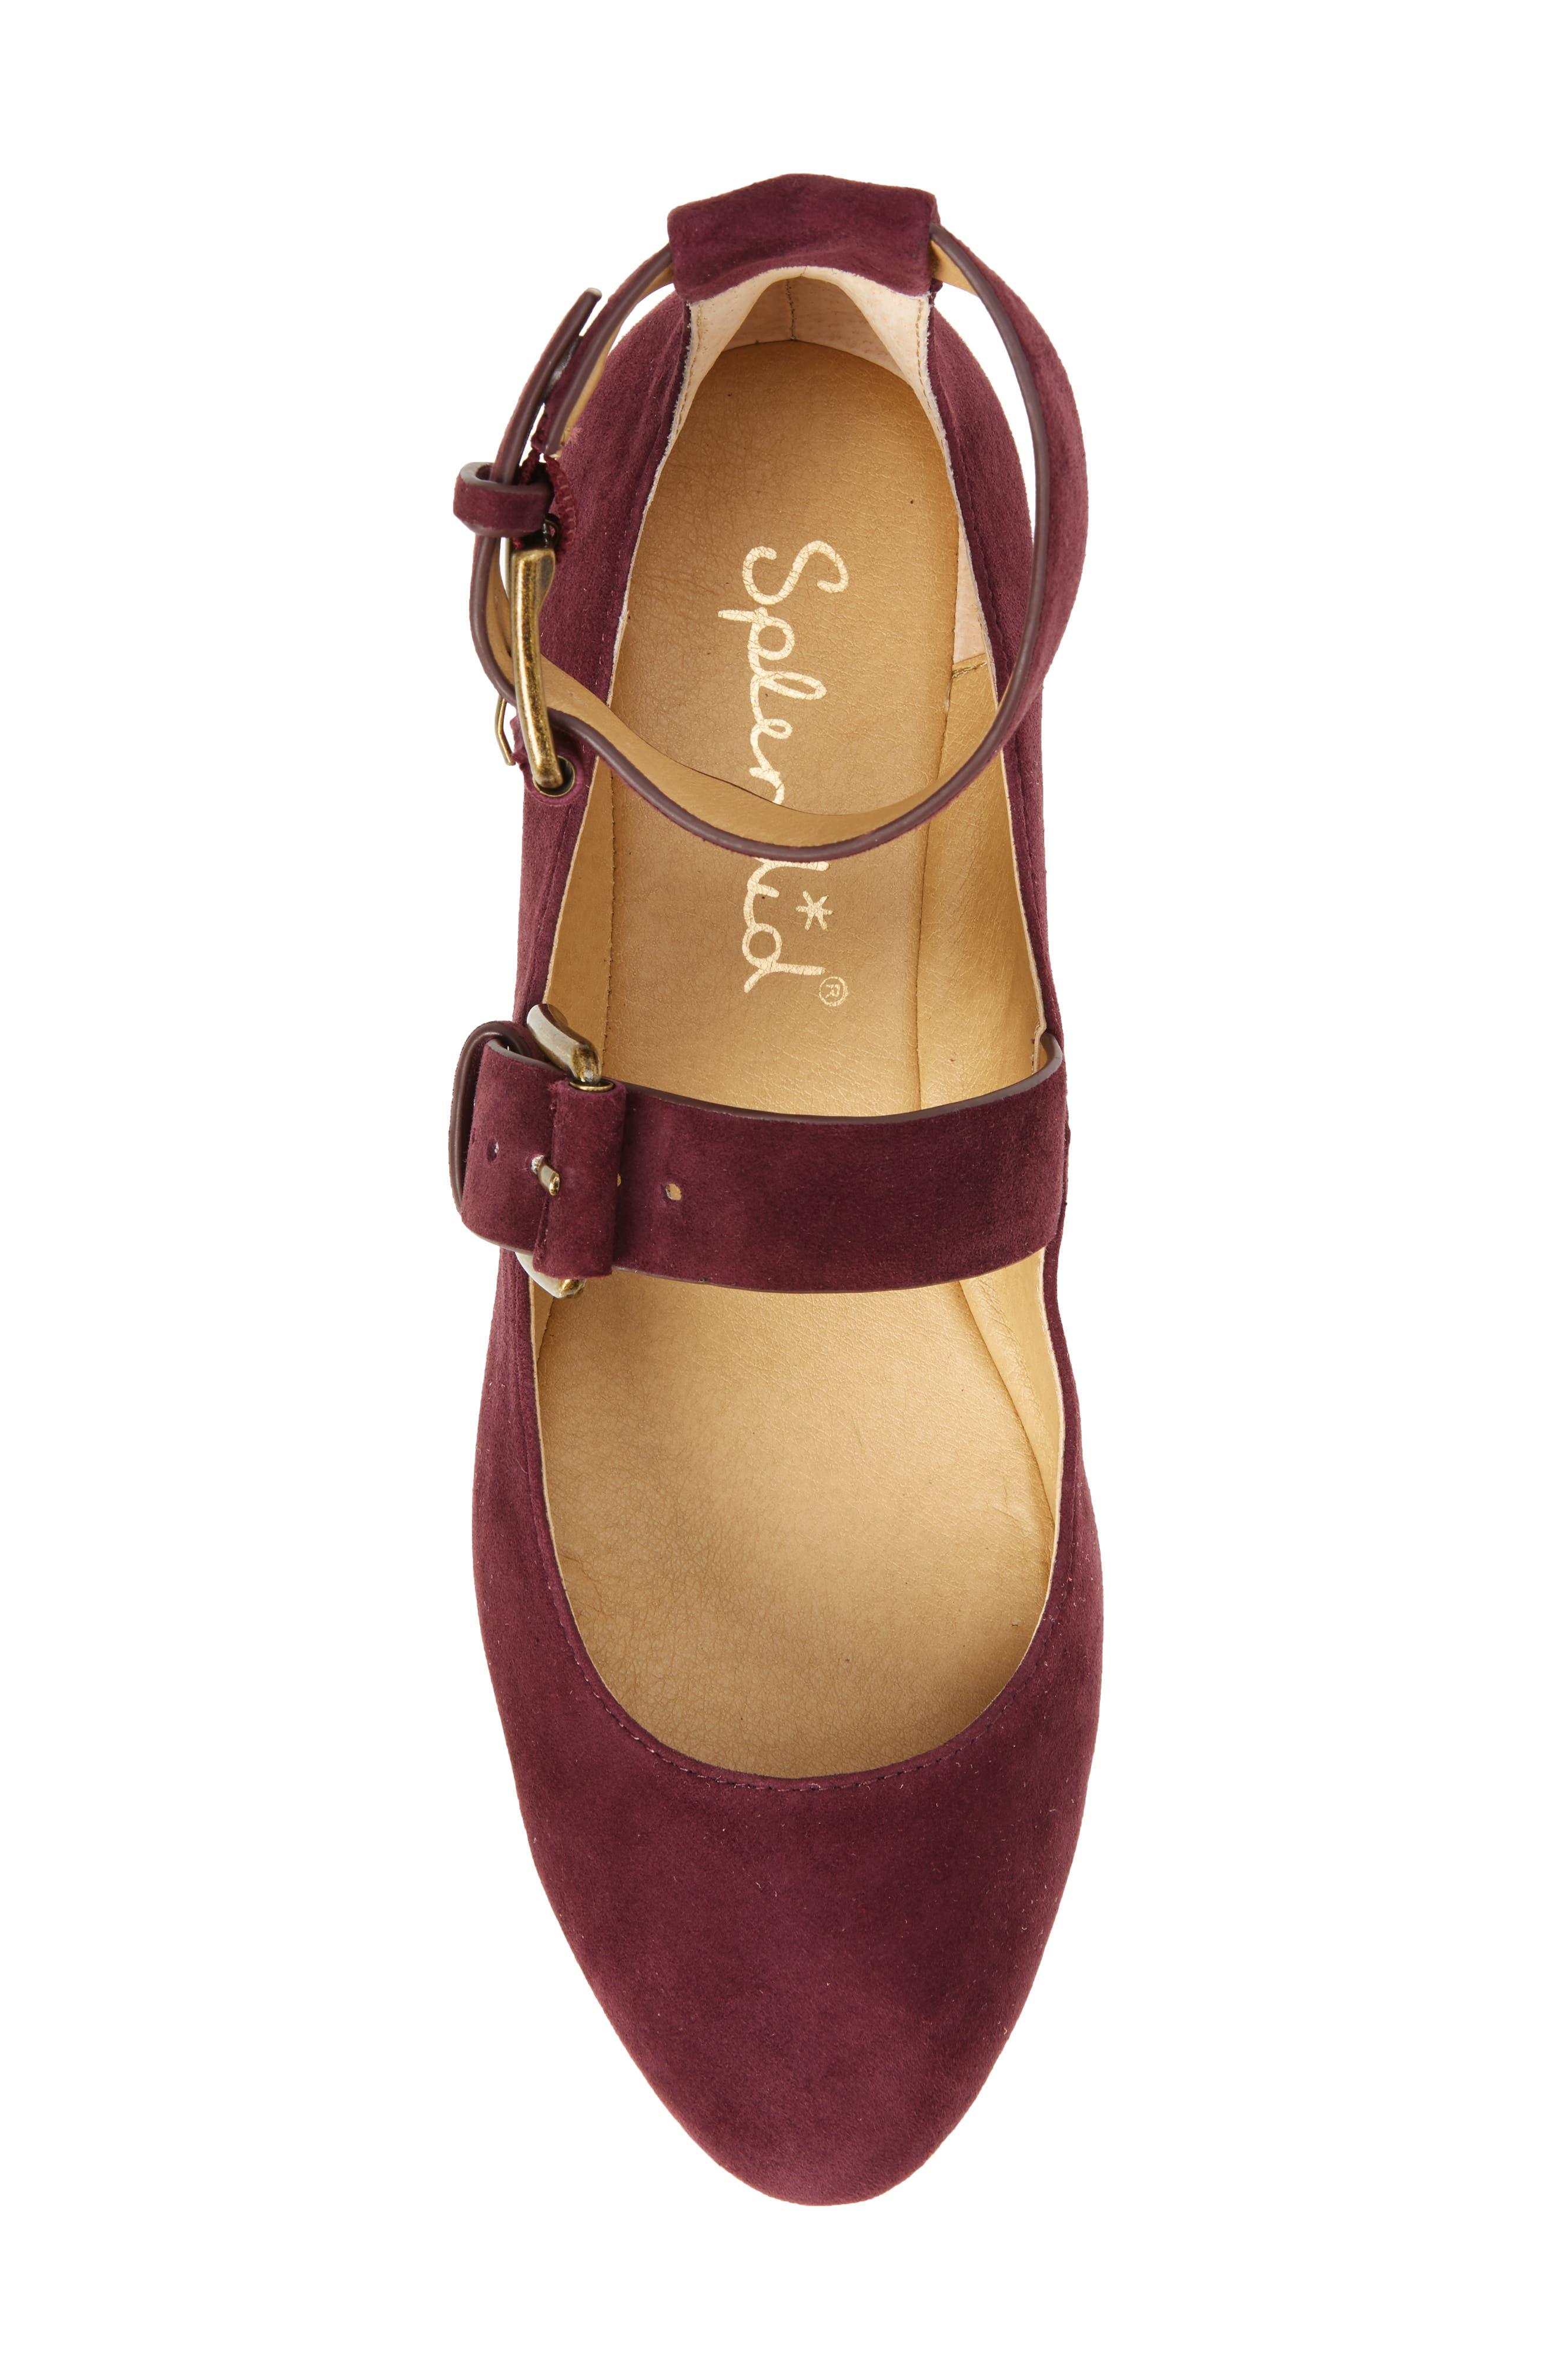 Dalenna Ankle Strap Ballet Flat,                             Alternate thumbnail 5, color,                             Wine Suede